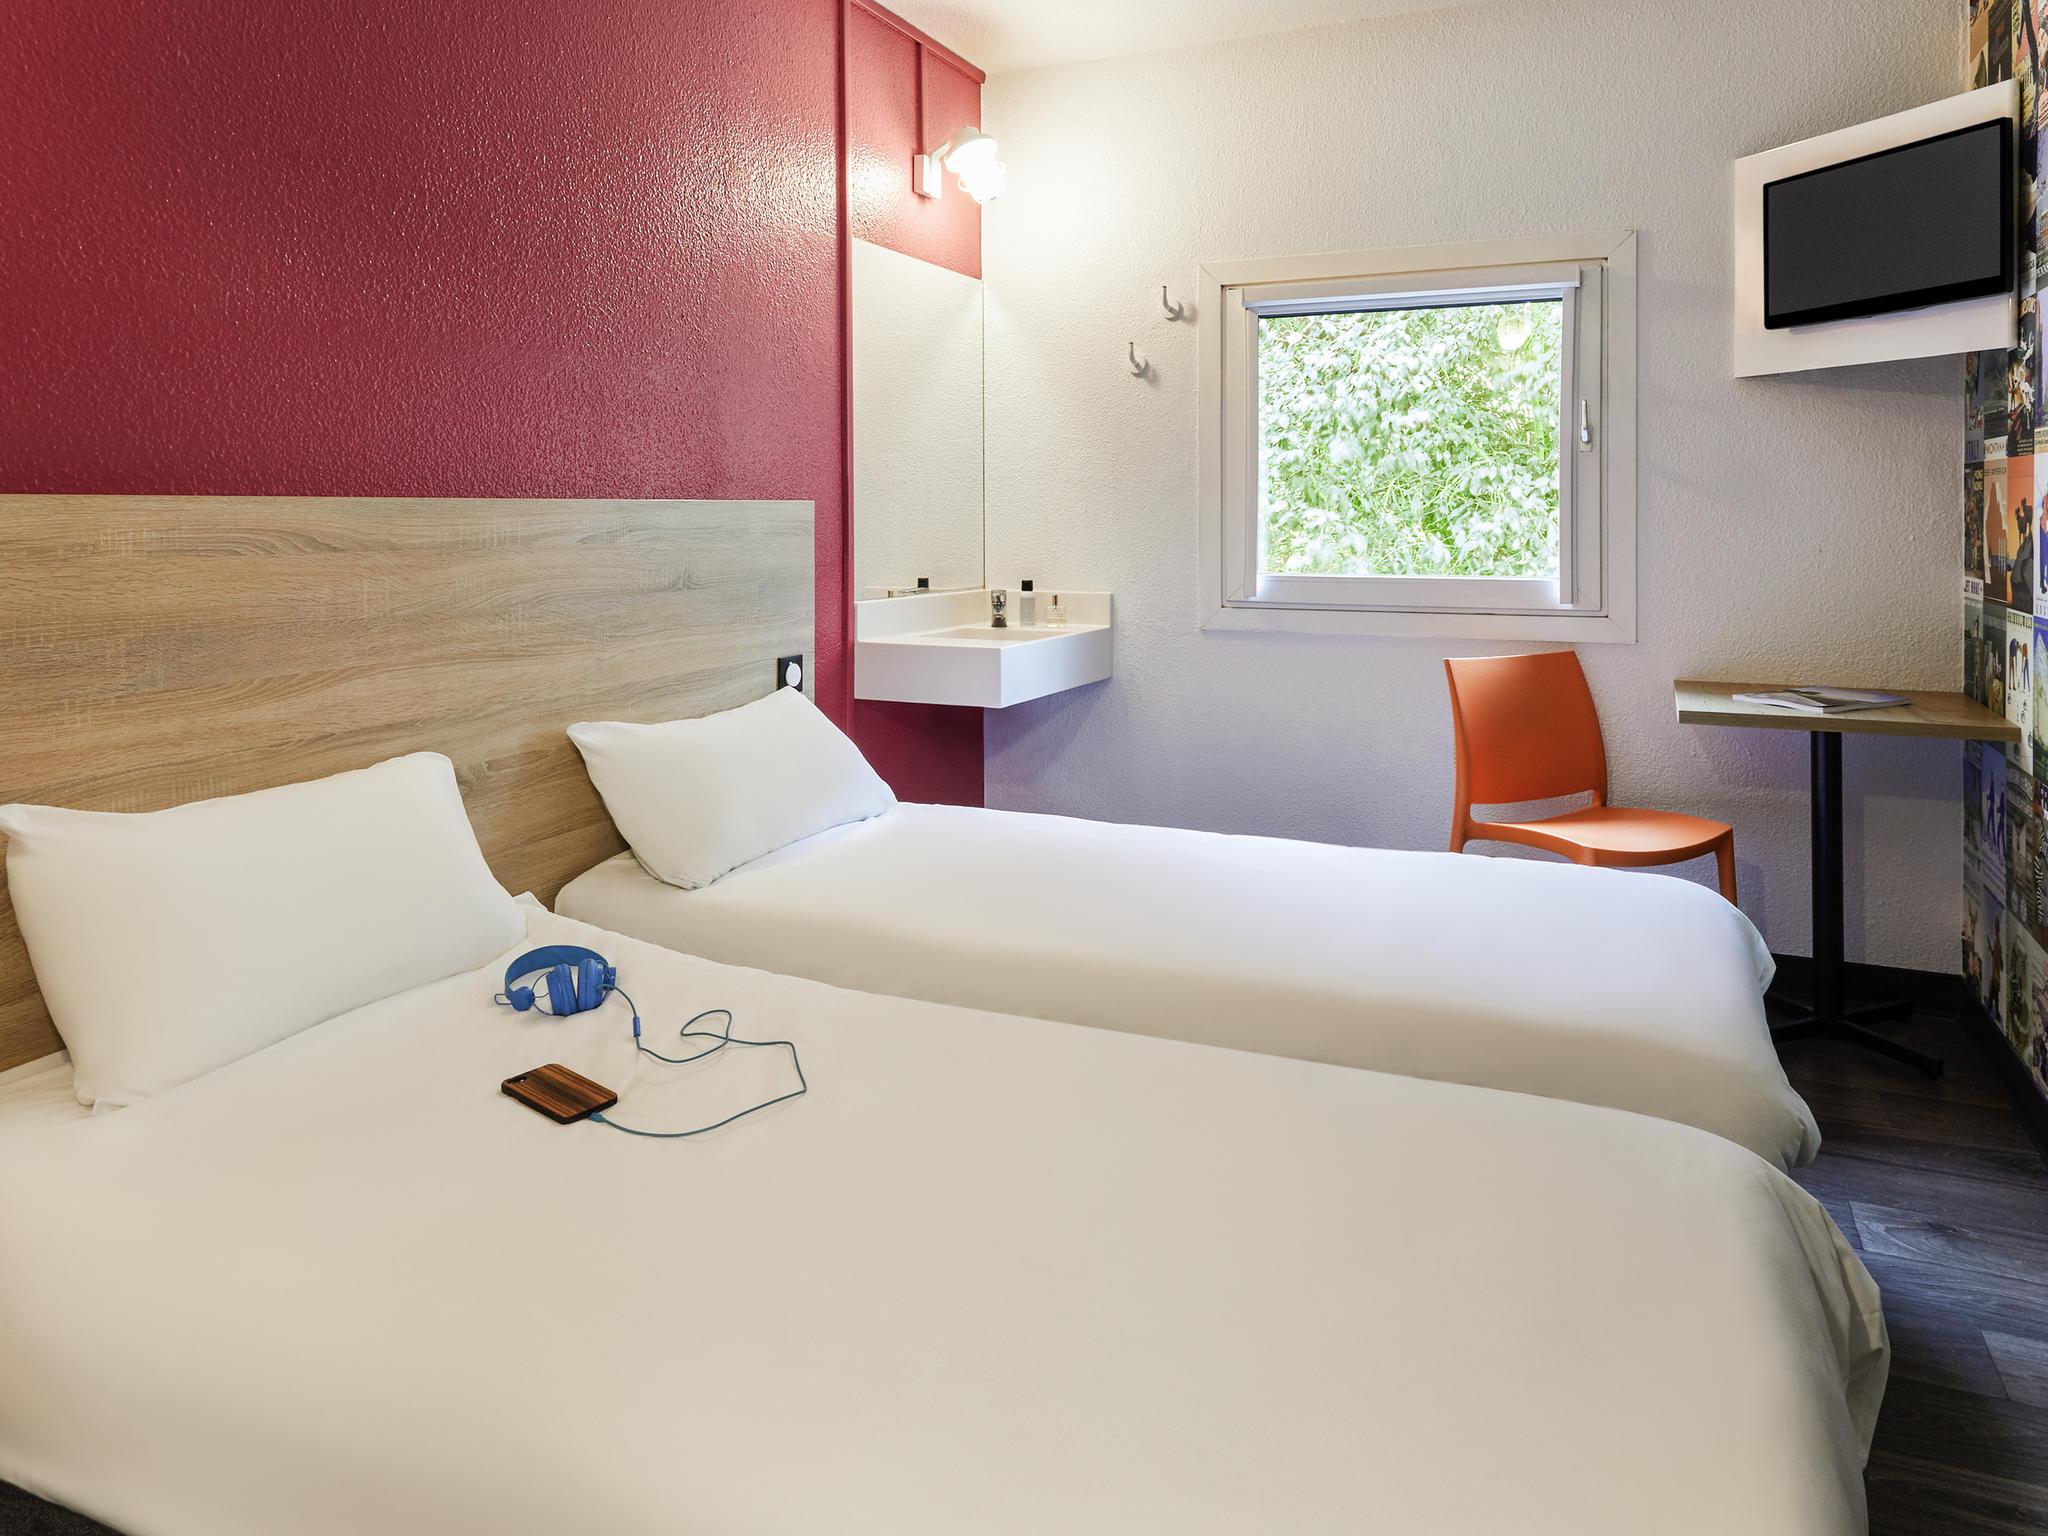 Hotel – hotelF1 Rungis Orly